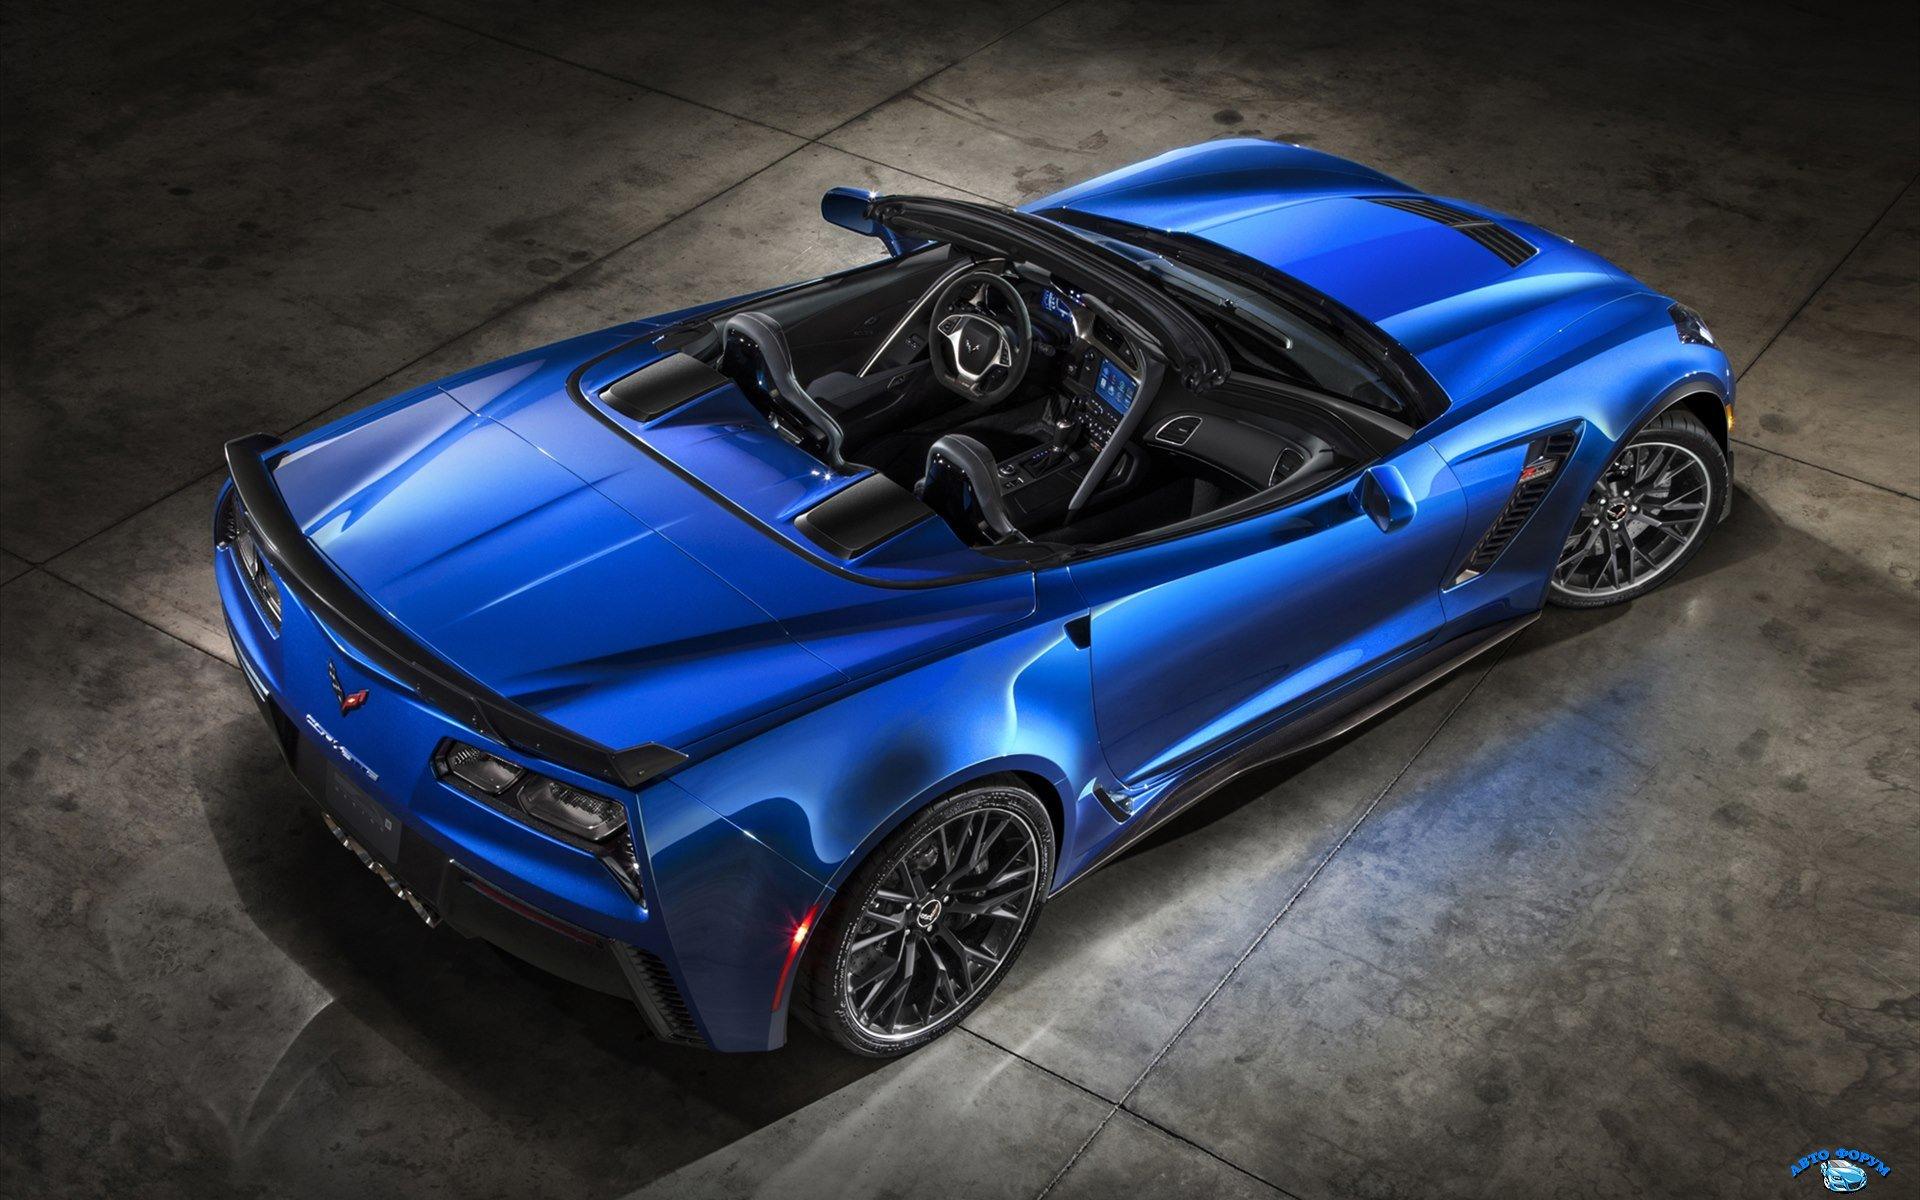 Chevrolet-Corvette-Z06-Convertible-2015-widescreen-07.jpg